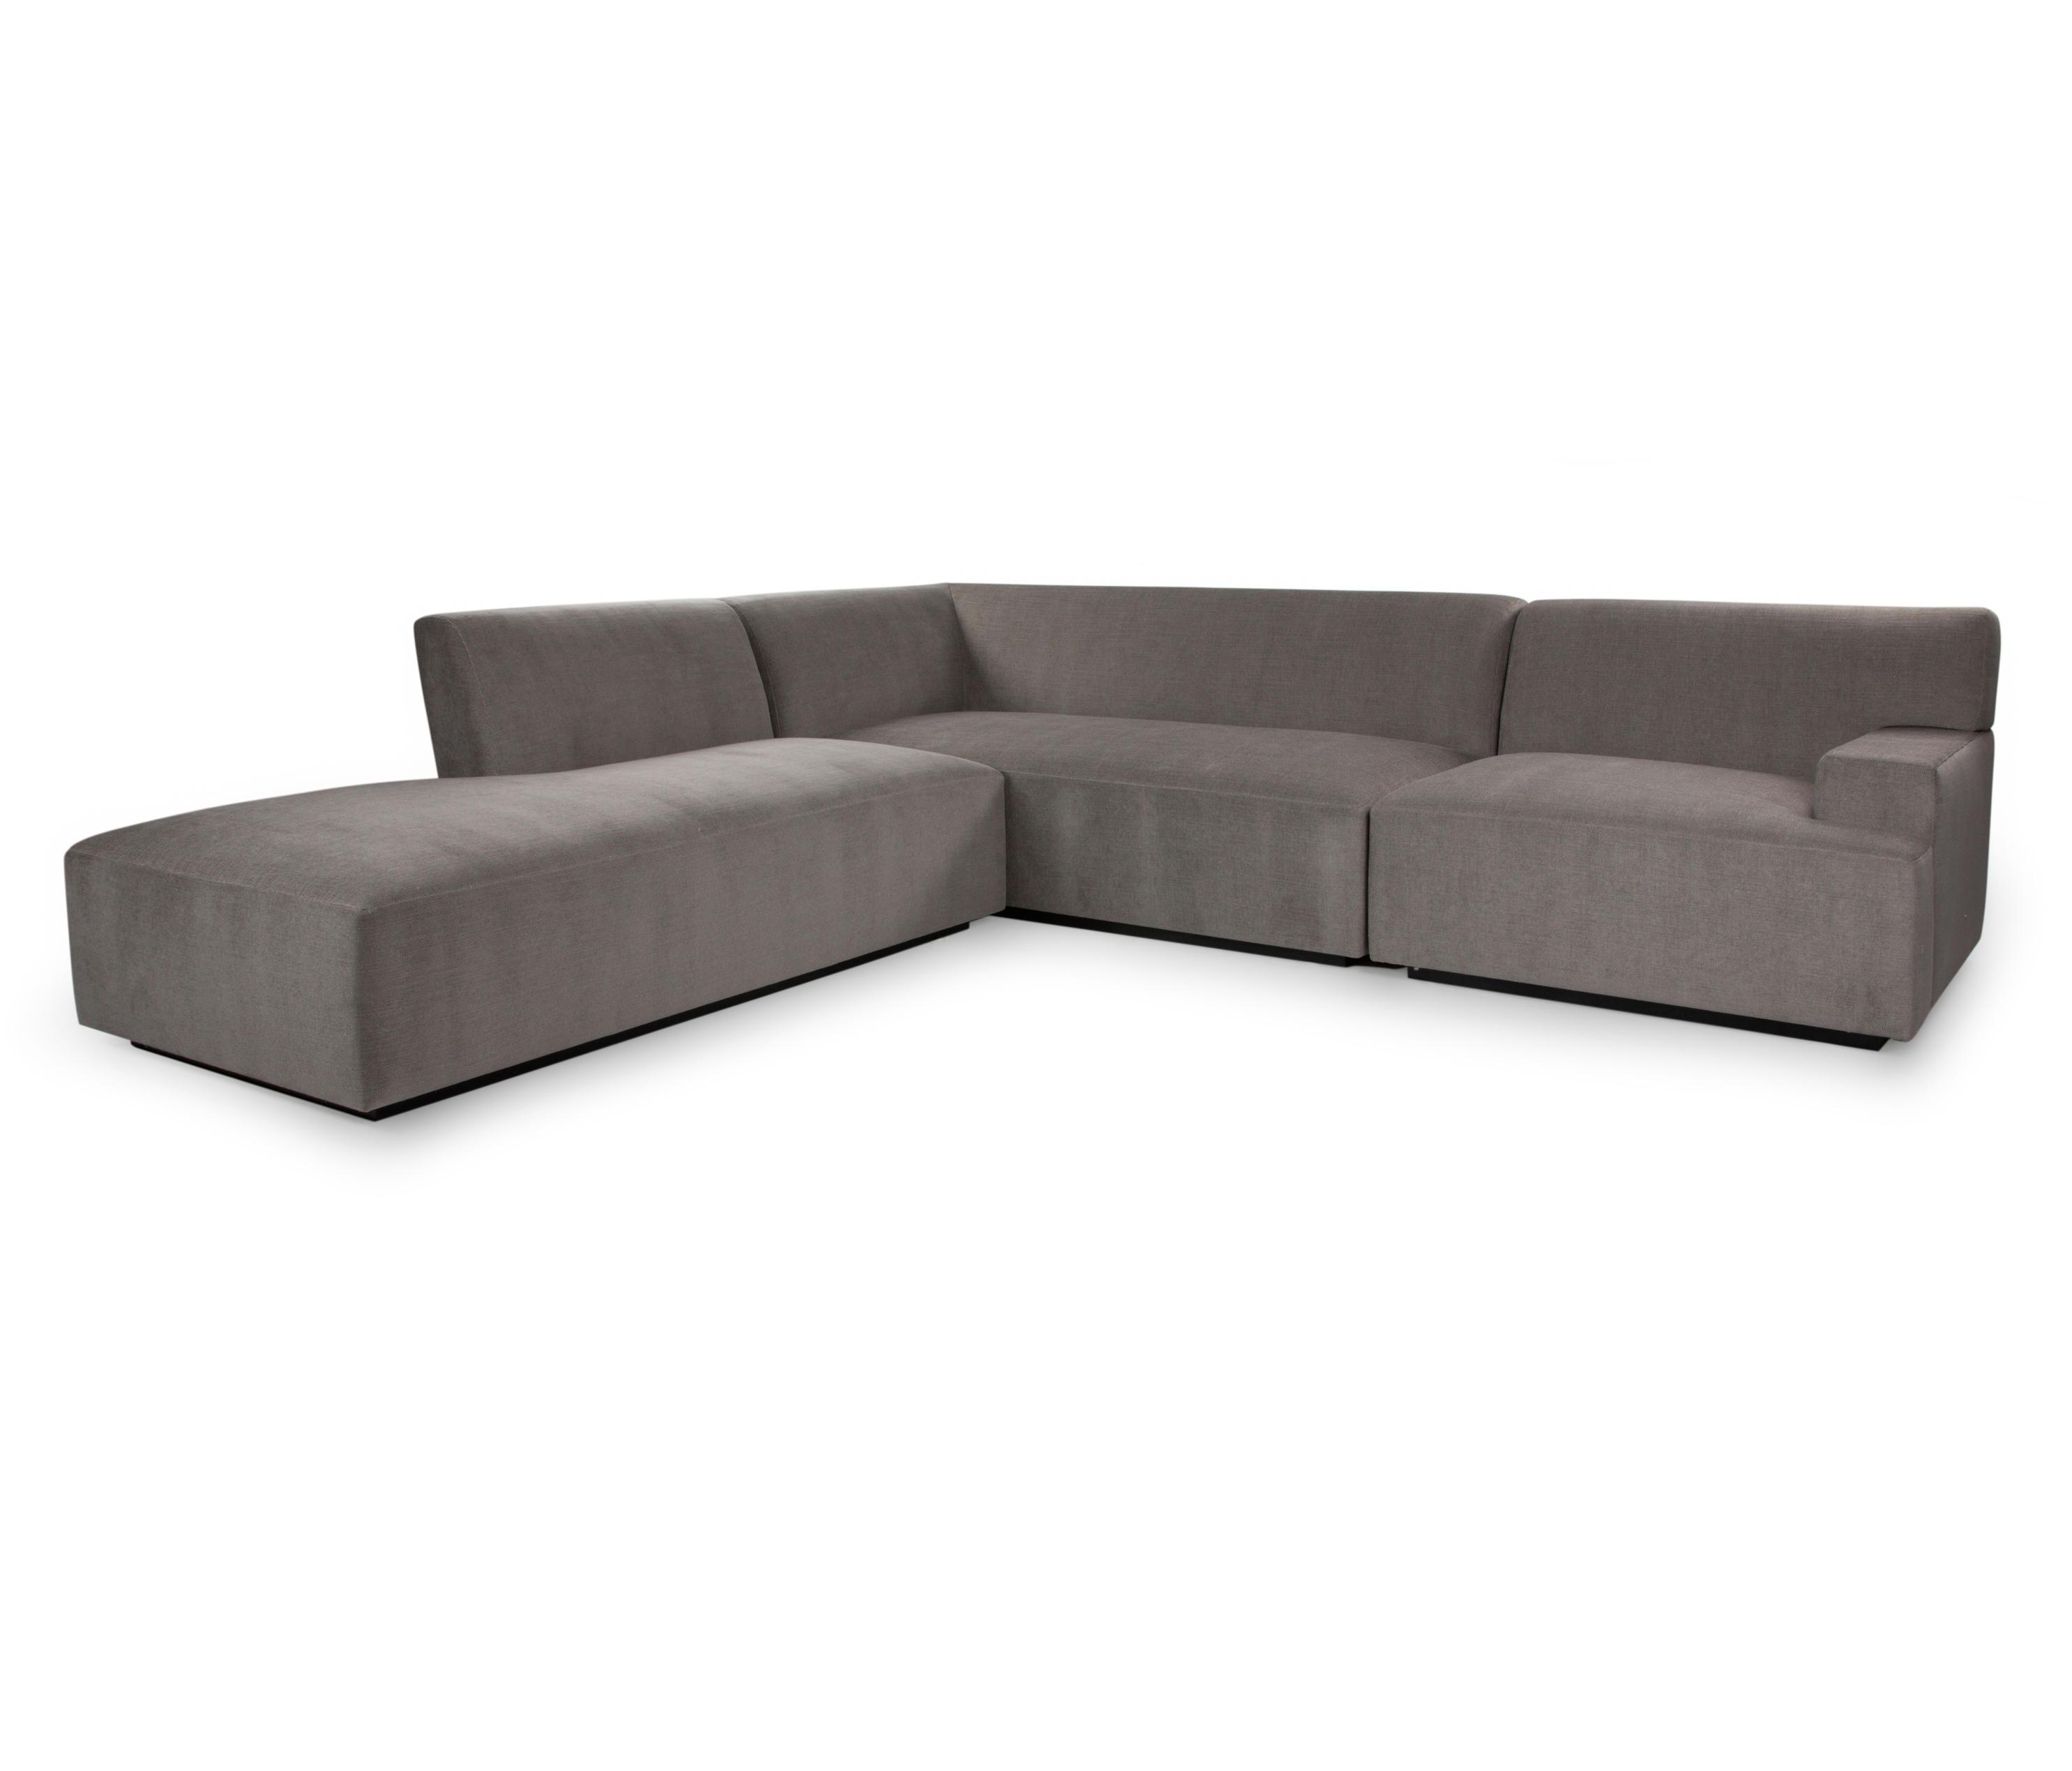 Riley Modular Sofa Designer Furniture